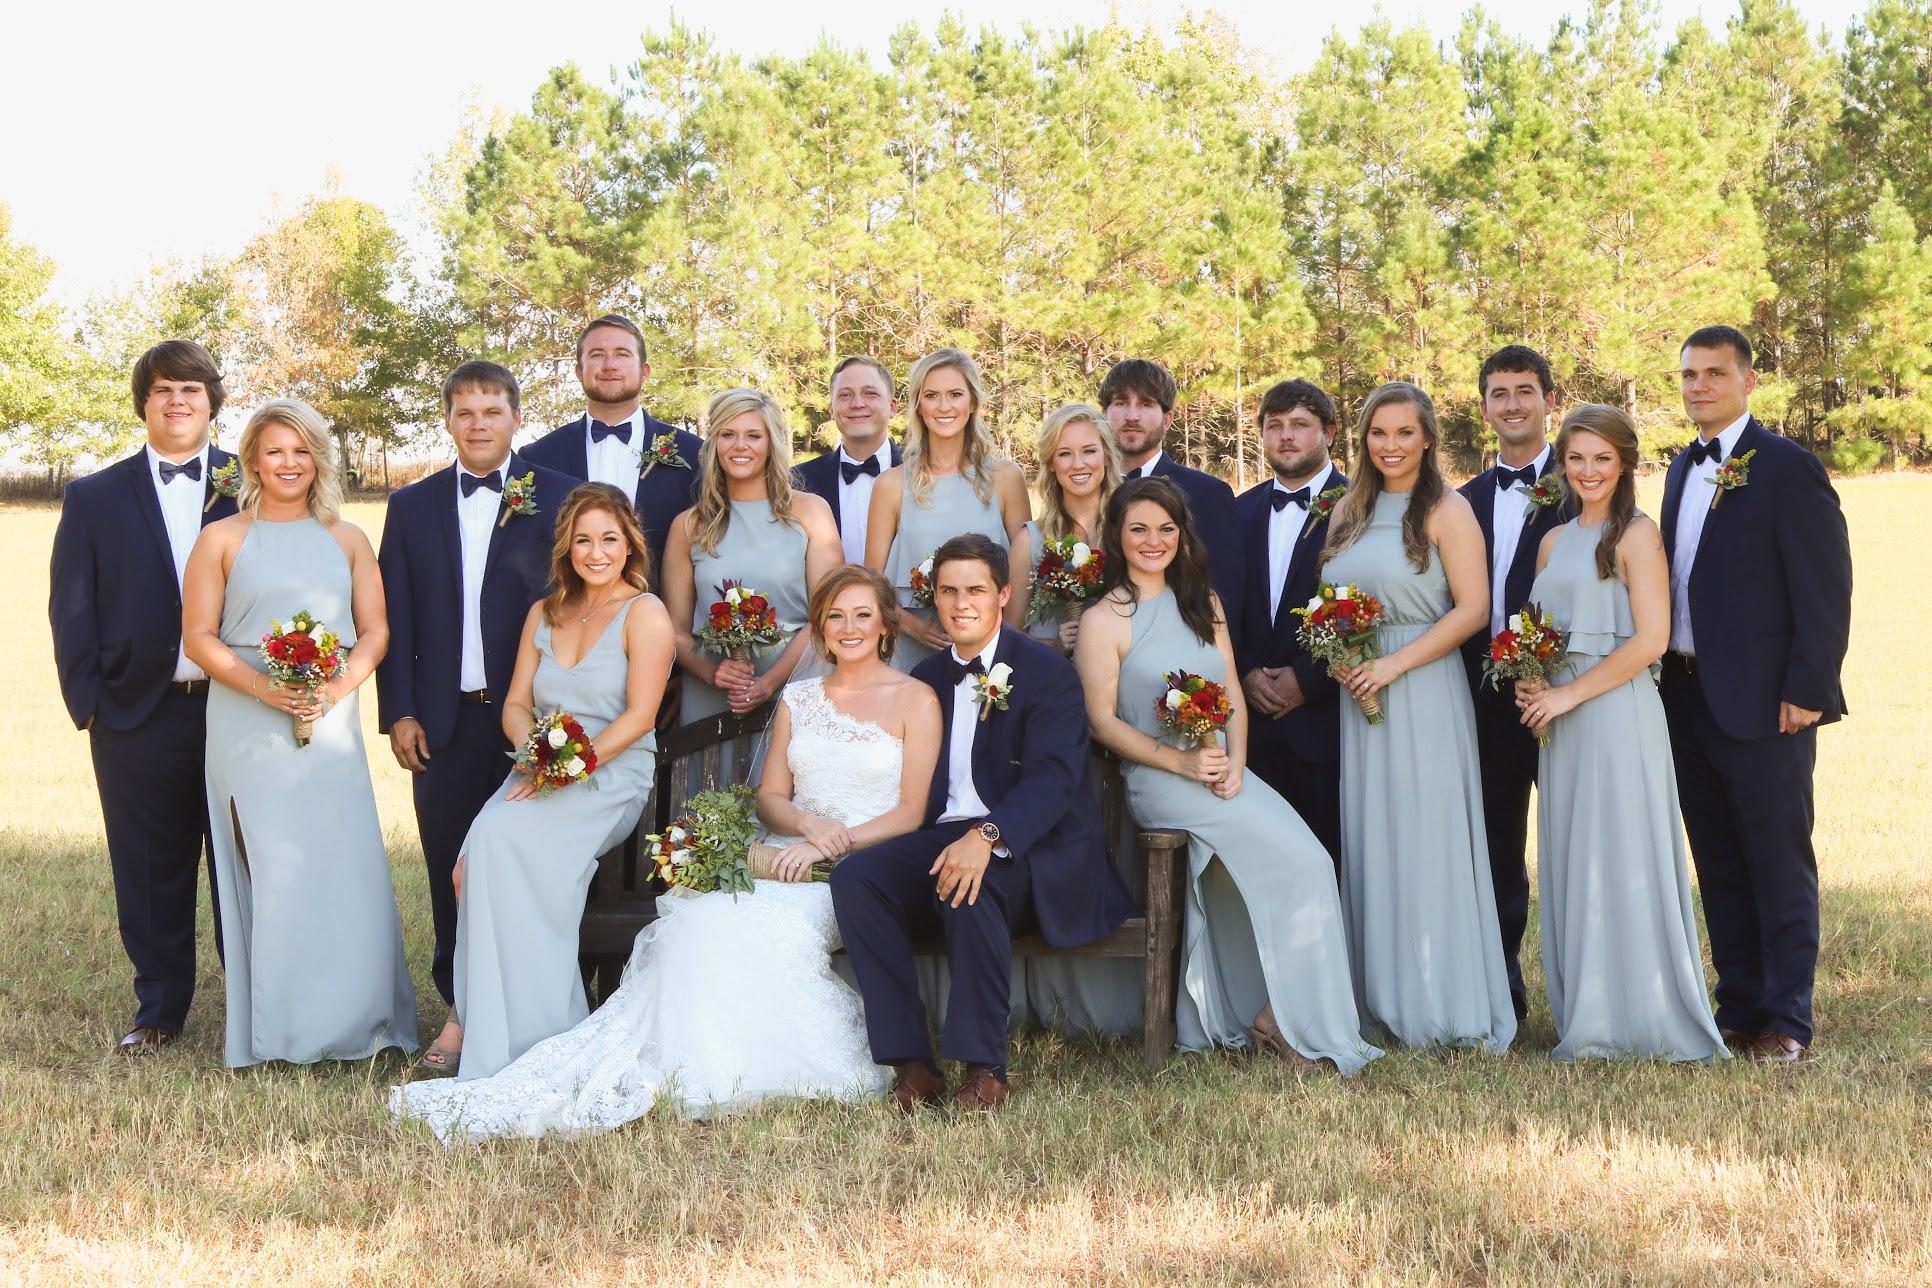 wedding party portrait wedding party in field